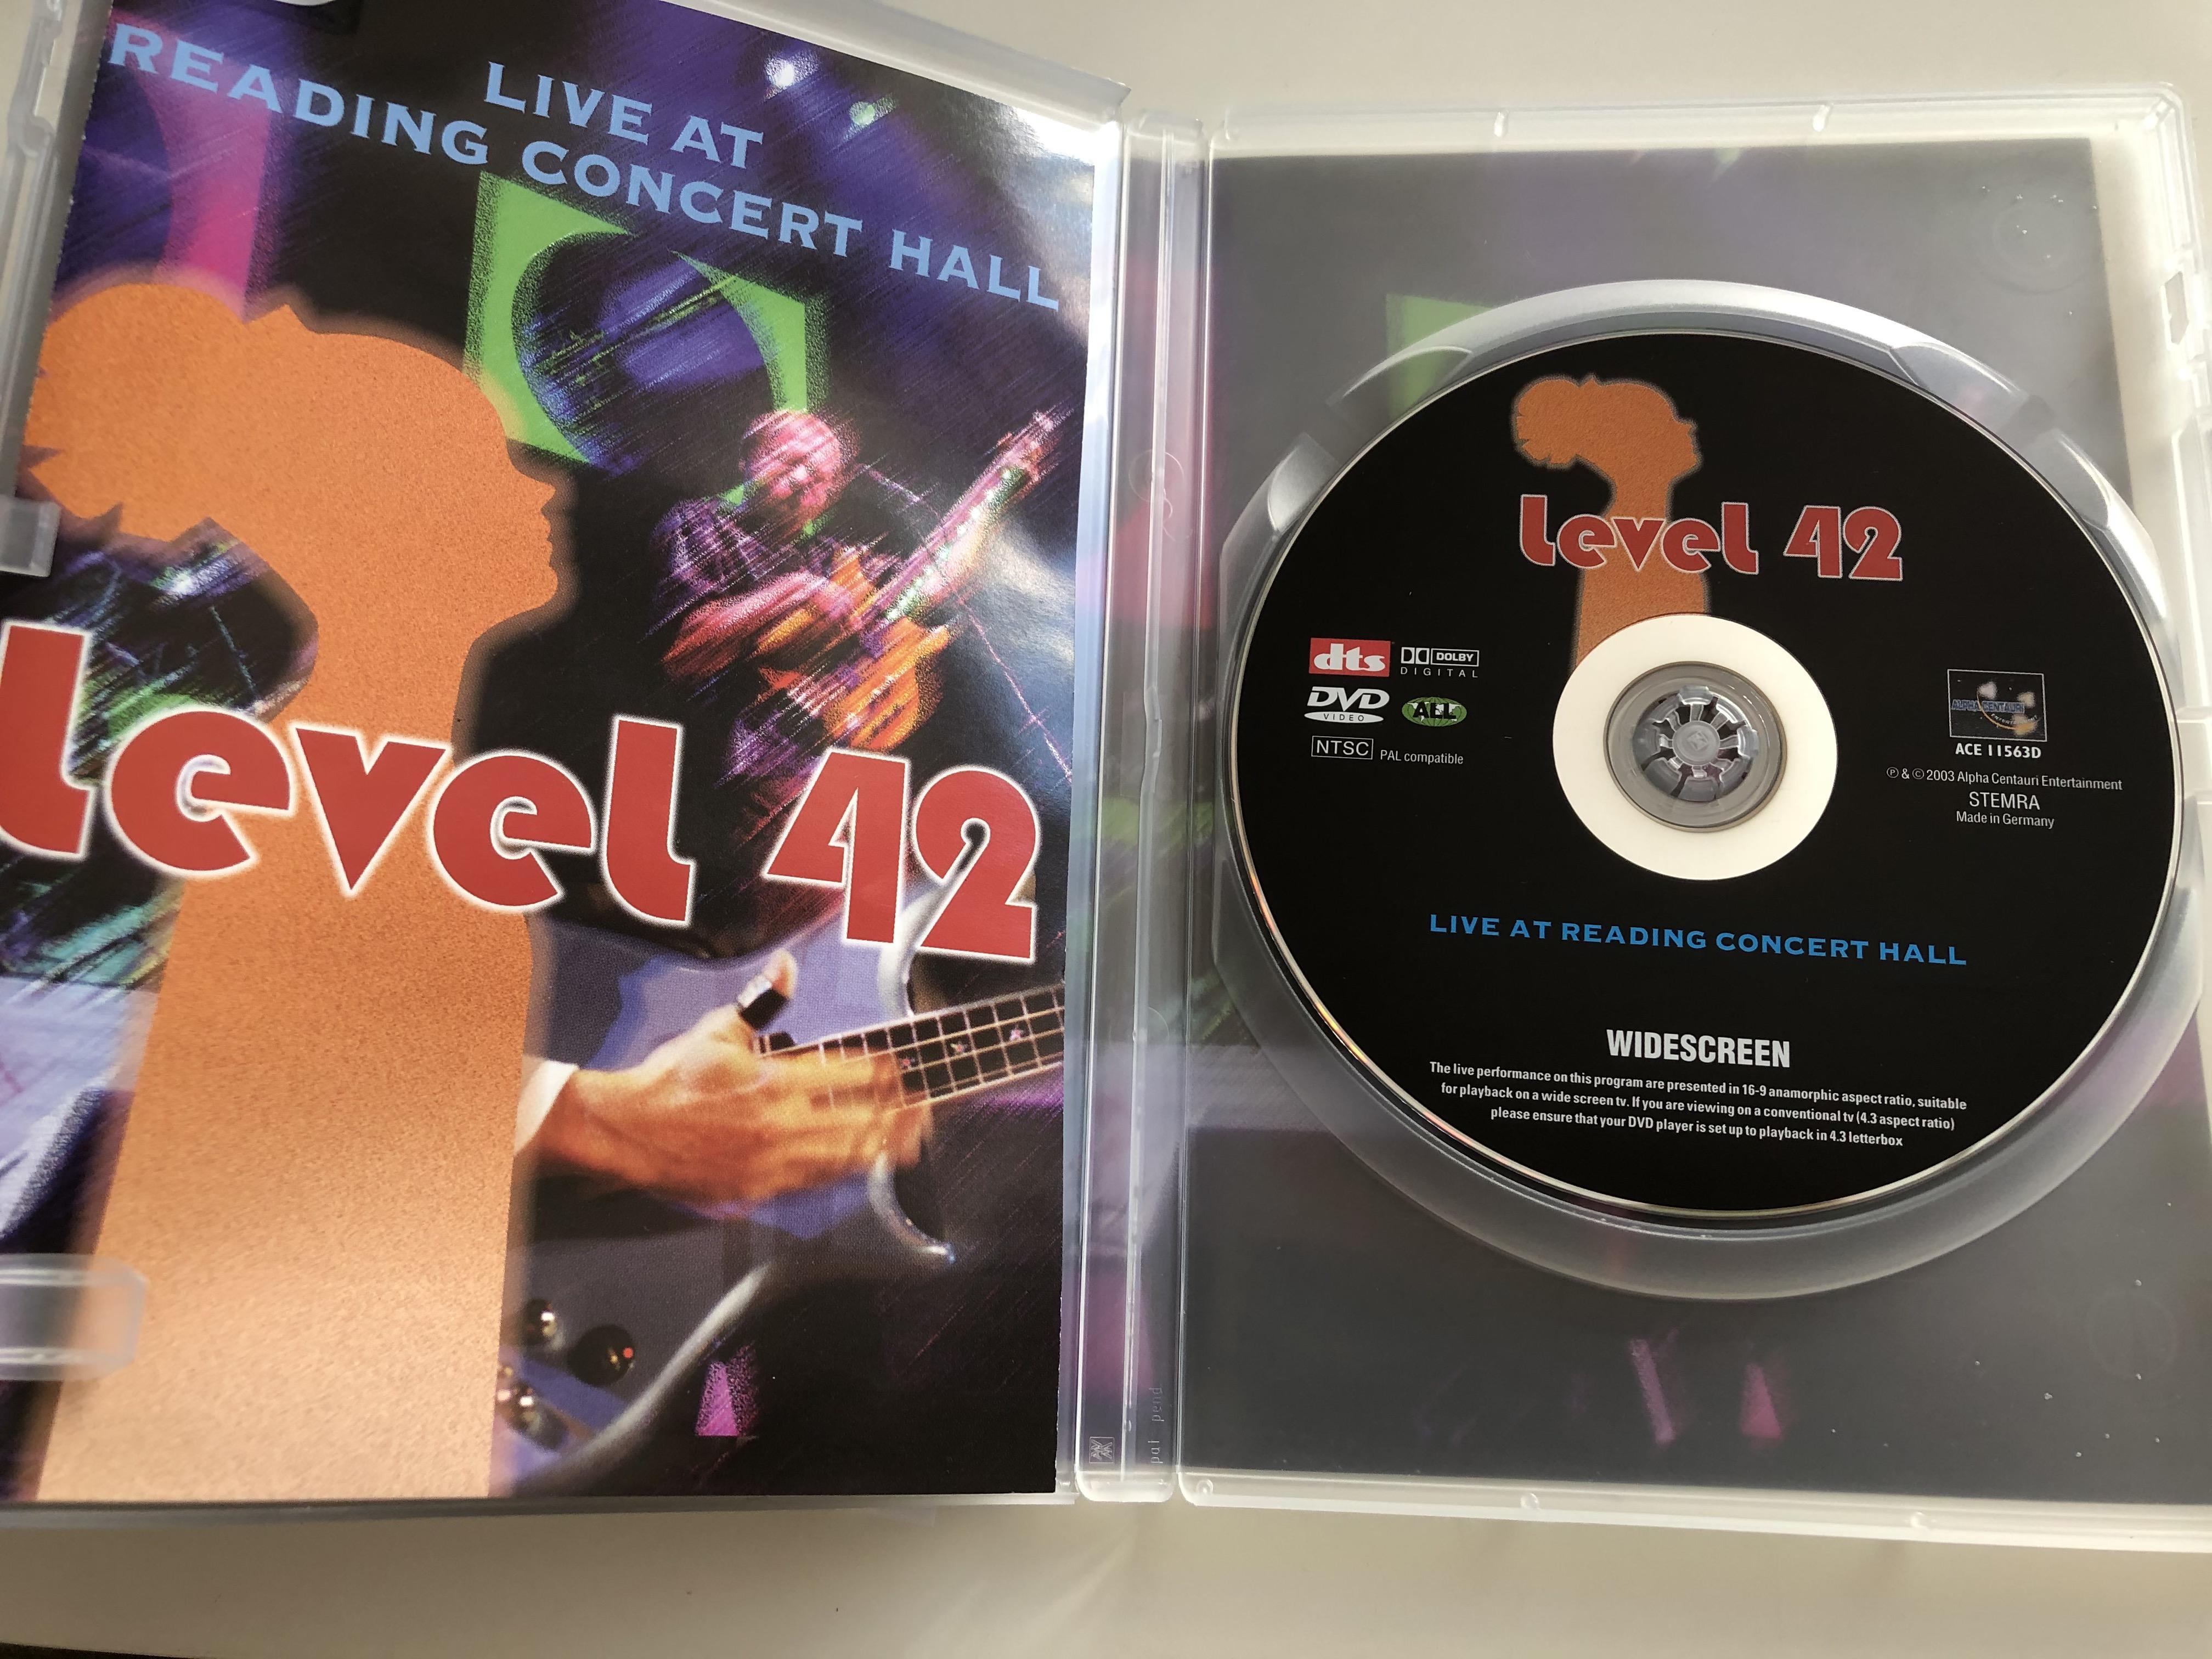 level-42-dvd-2001-live-at-reading-concert-hall-3.jpg